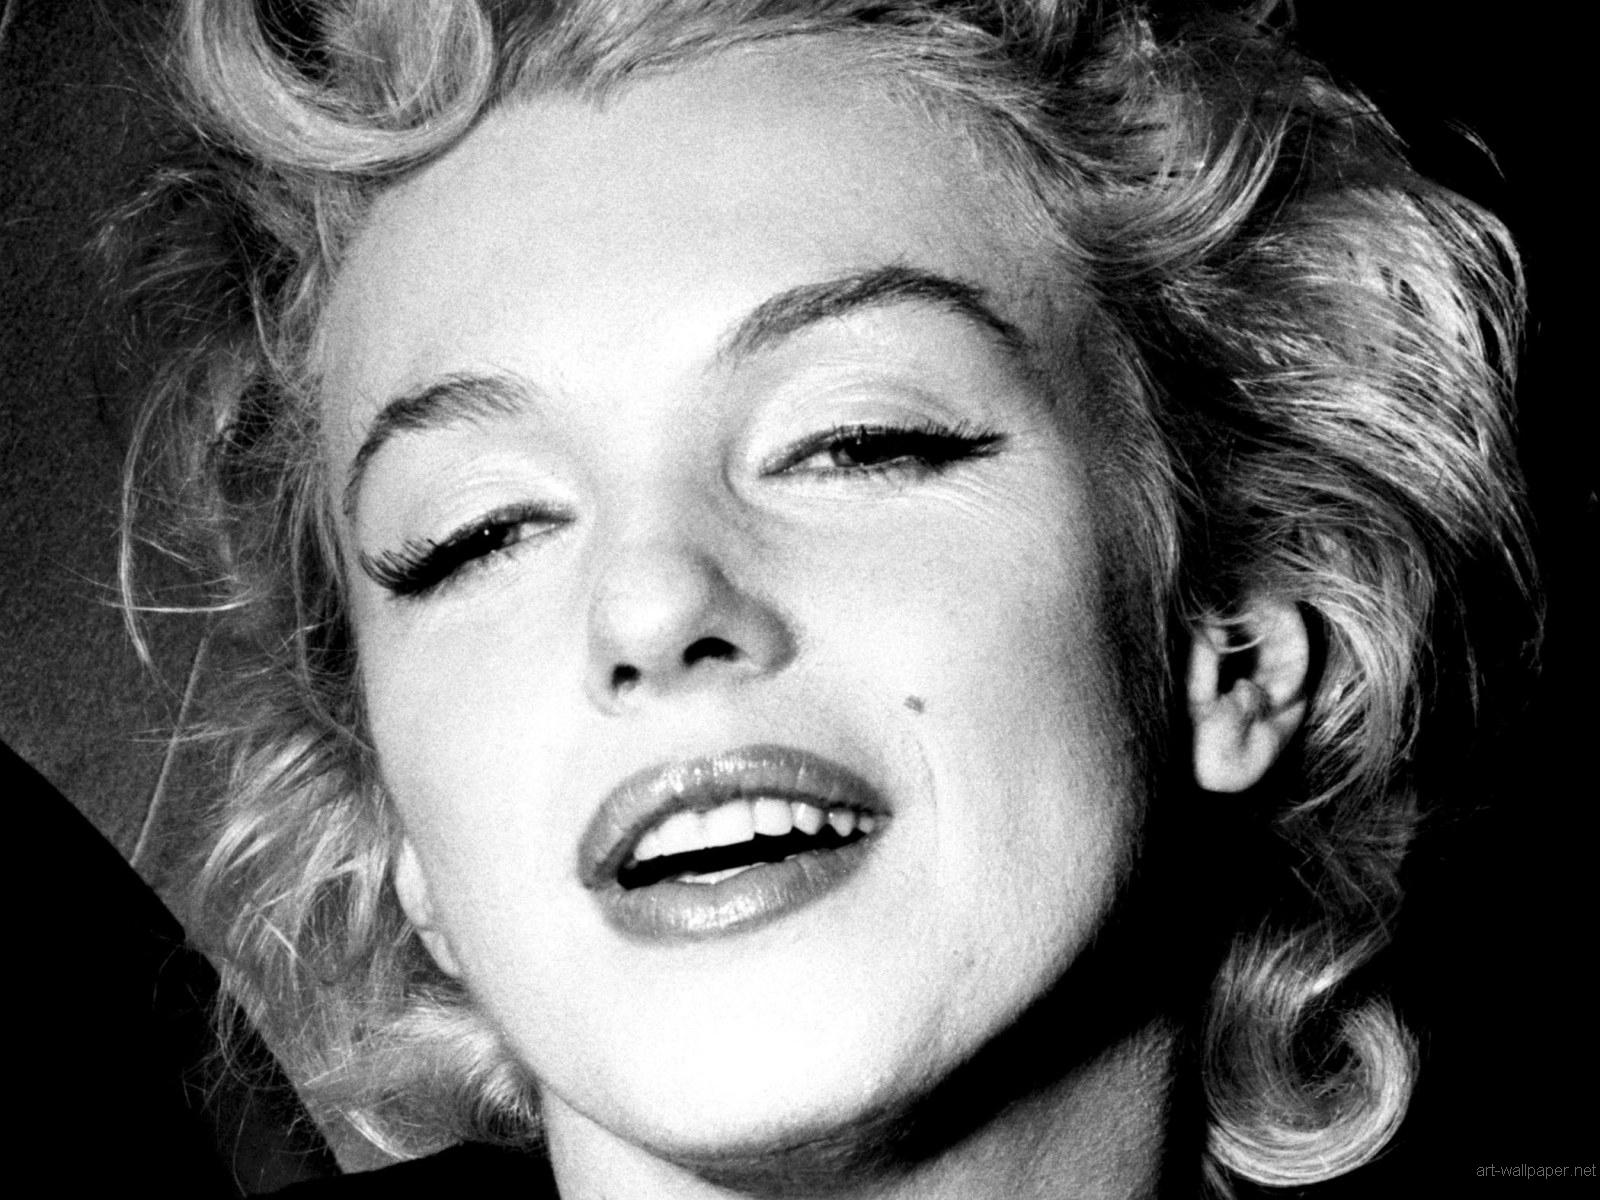 http://2.bp.blogspot.com/-XdtGOxUlMIk/UTJQEQKF7DI/AAAAAAAACt4/xEBk8kuYk74/s1600/Marilyn-Monroe-wallpaper_038.jpg